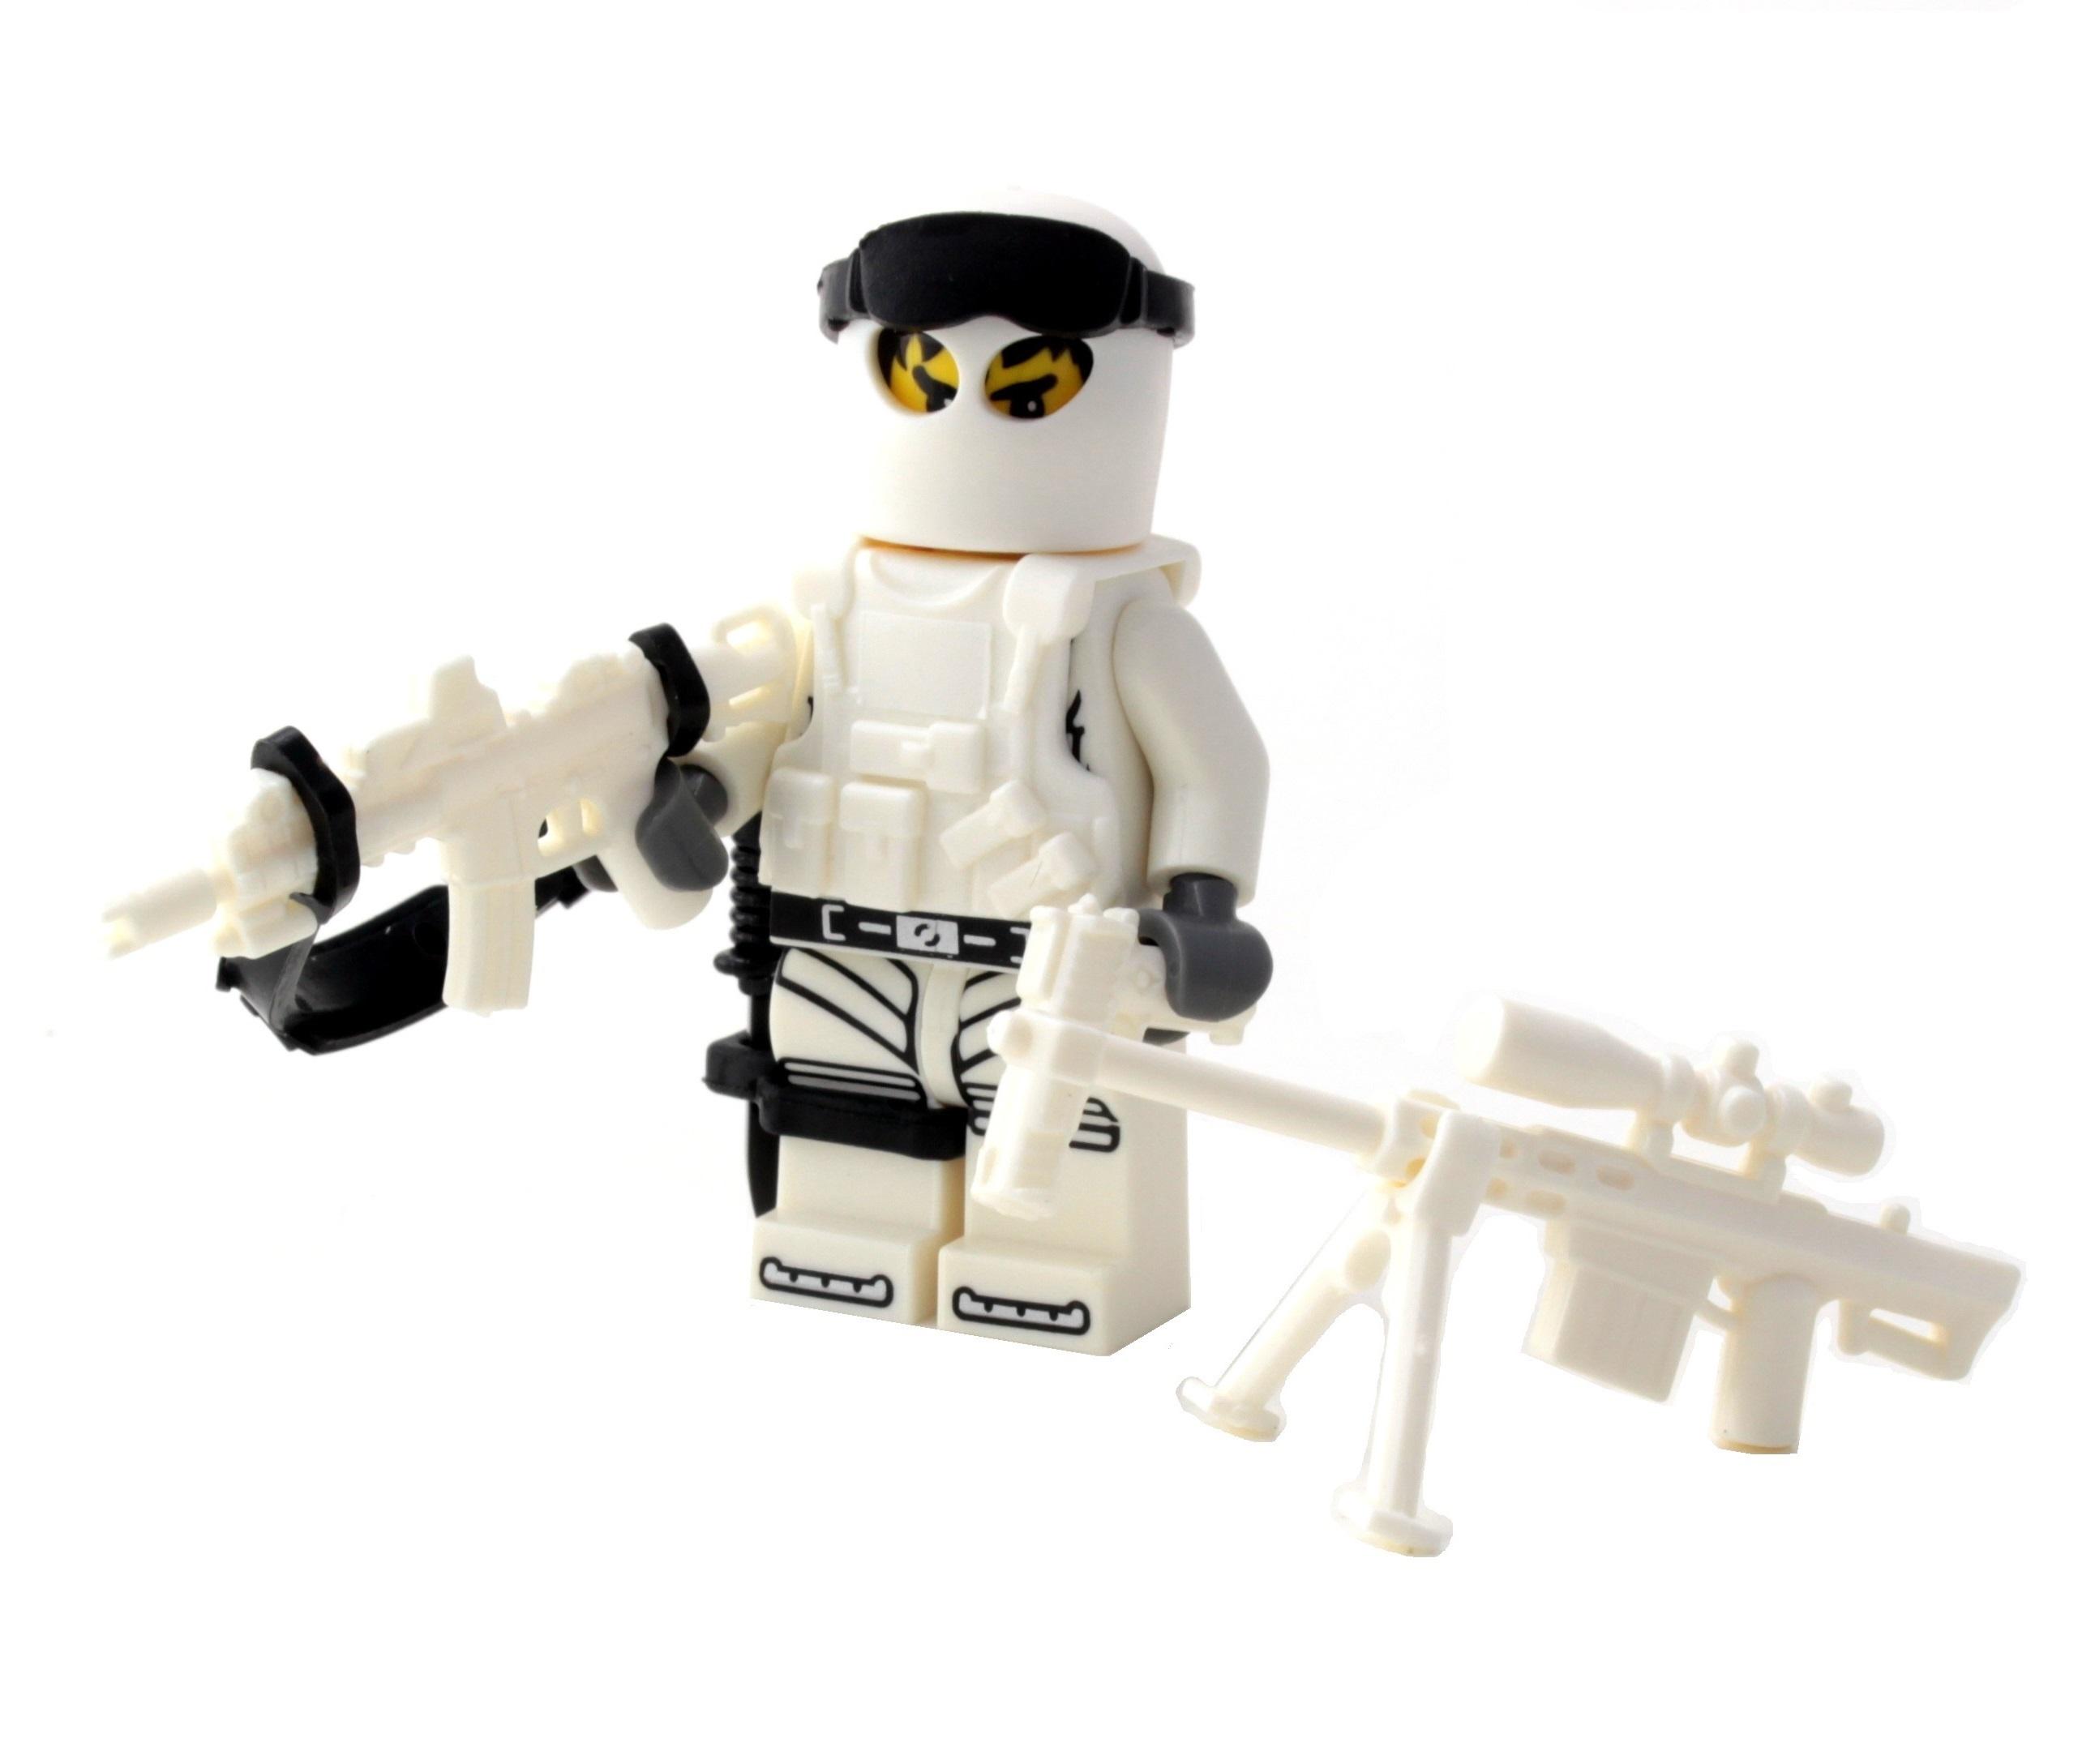 Custom Special Forces Winter Army Commando Minifigure